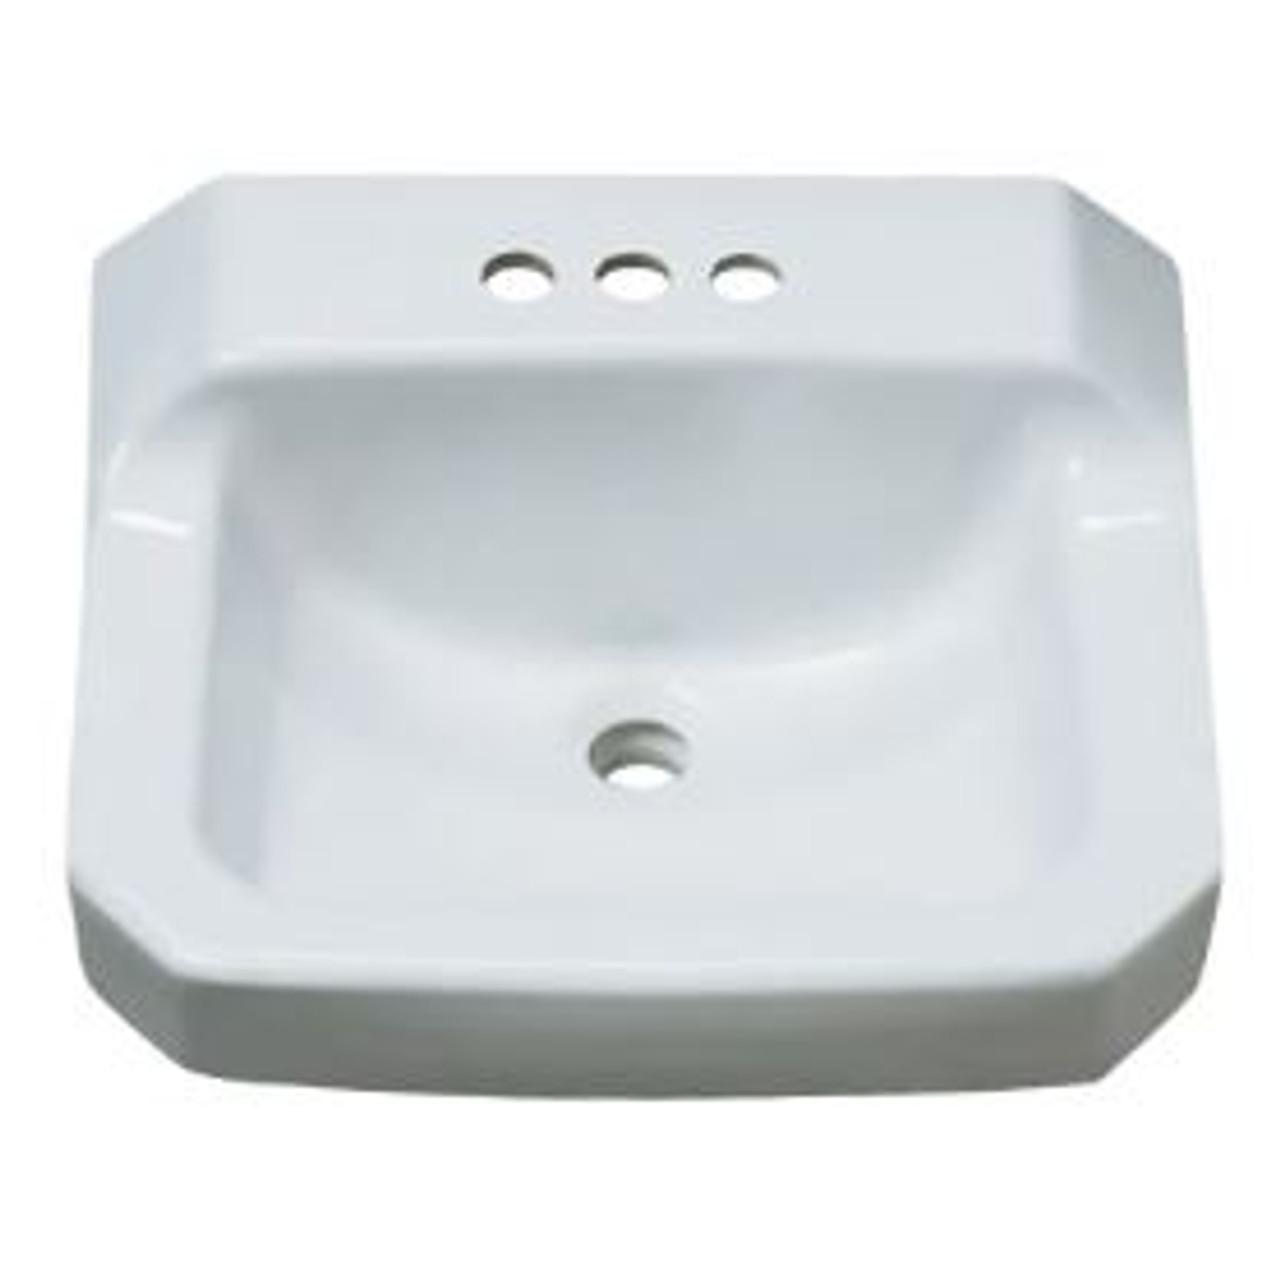 Proflo 19 5 8 Wall Mounted Rectangular Bathroom Sink 3 Holes Drilled Royal Bath Place